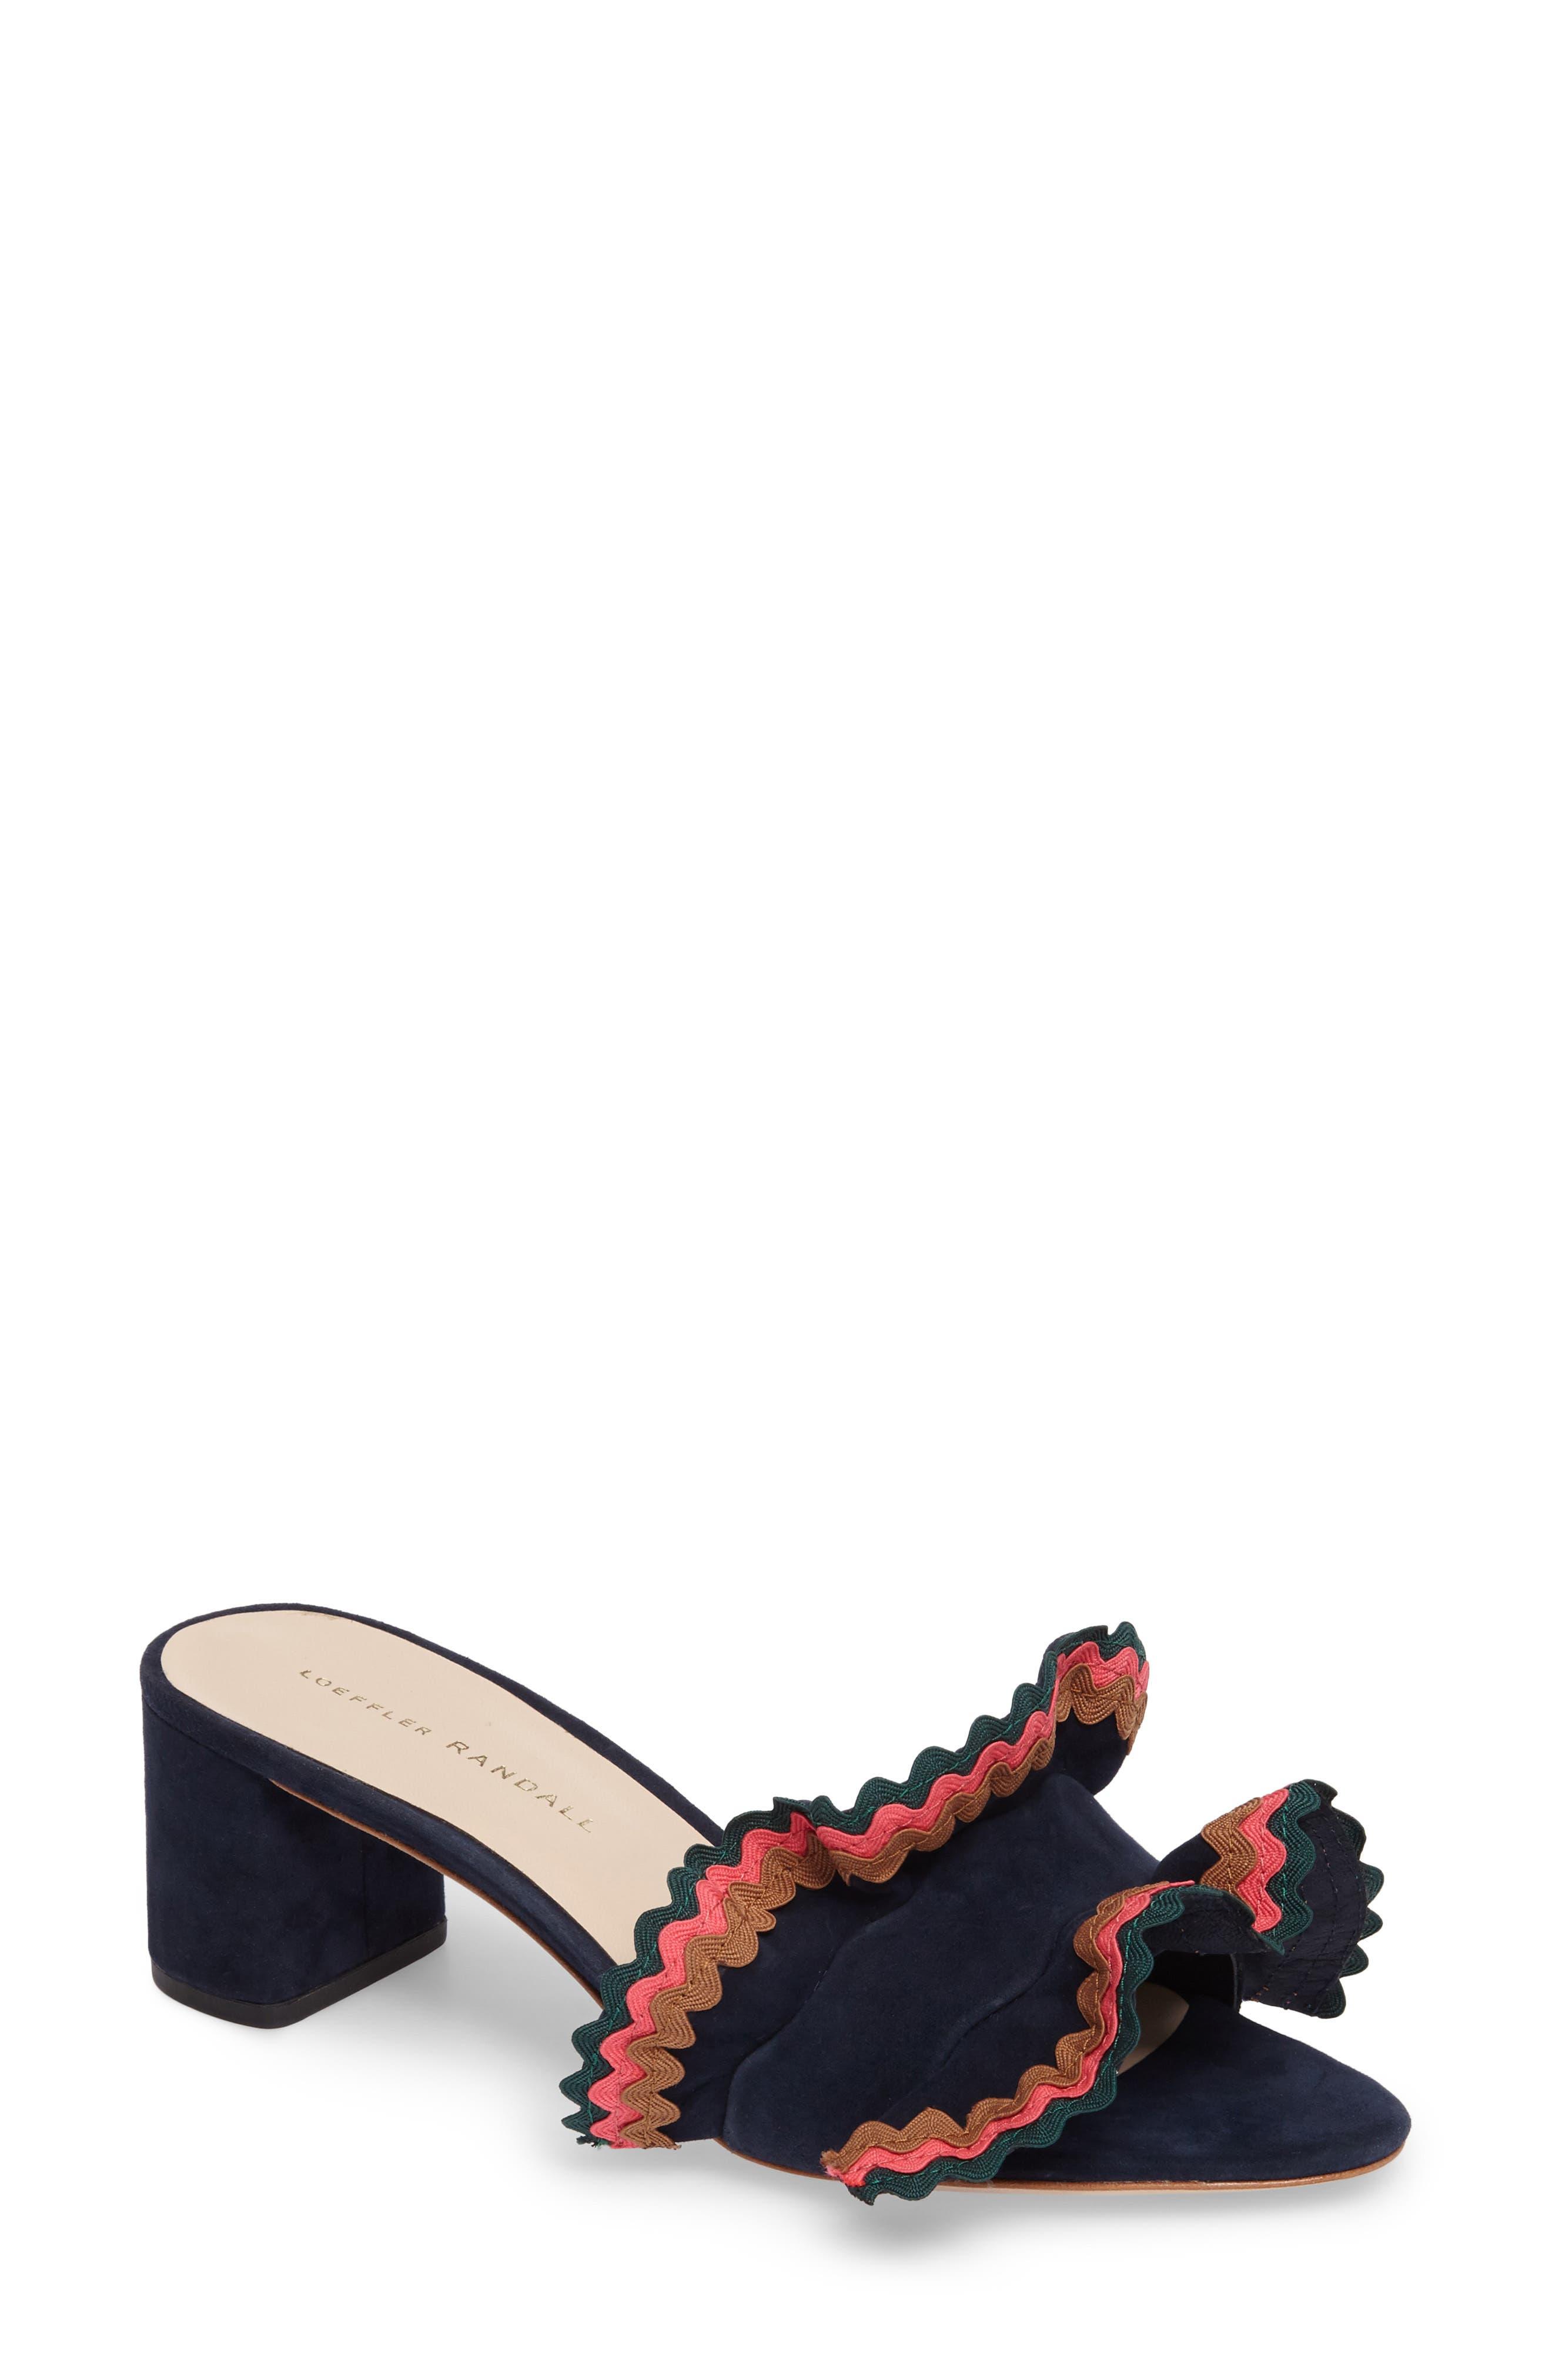 Vera Ruffled Slide Sandal,                         Main,                         color, 499